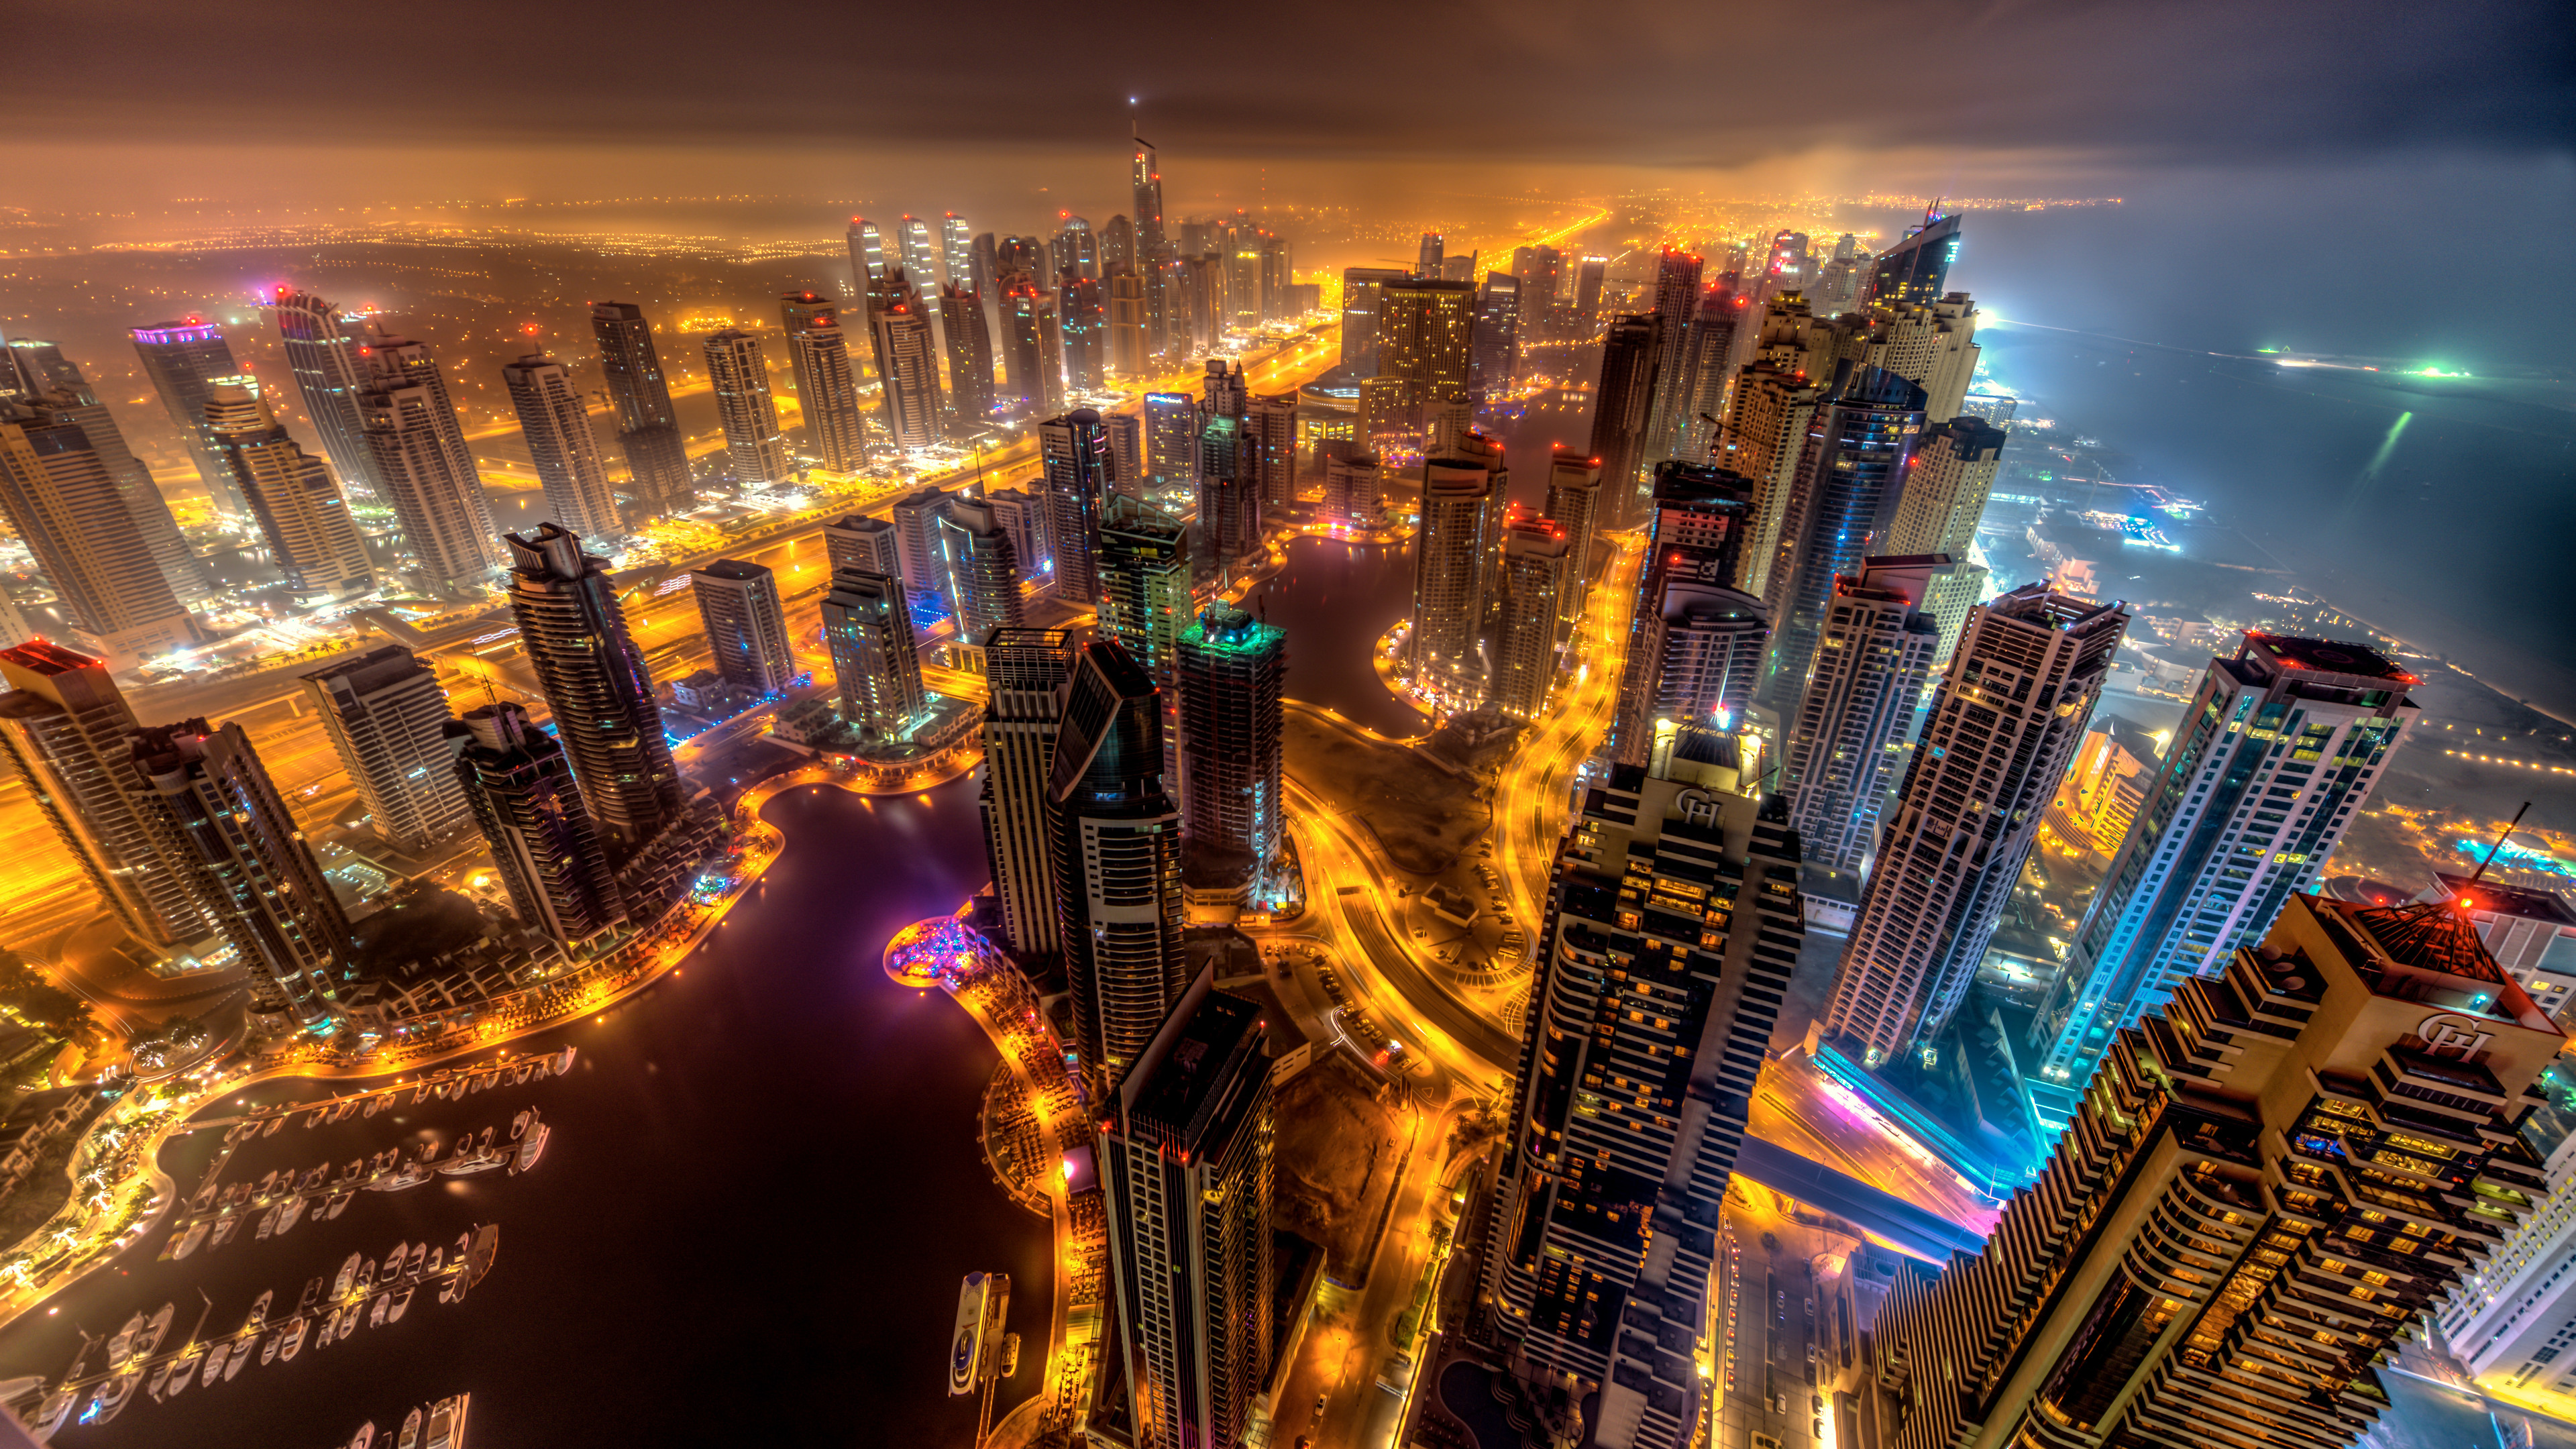 dubai buildings night lights top view 8k 1538069560 - Dubai Buildings Night Lights Top View 8k - world wallpapers, lights wallpapers, hd-wallpapers, dubai wallpapers, buildings wallpapers, 8k wallpapers, 5k wallpapers, 4k-wallpapers